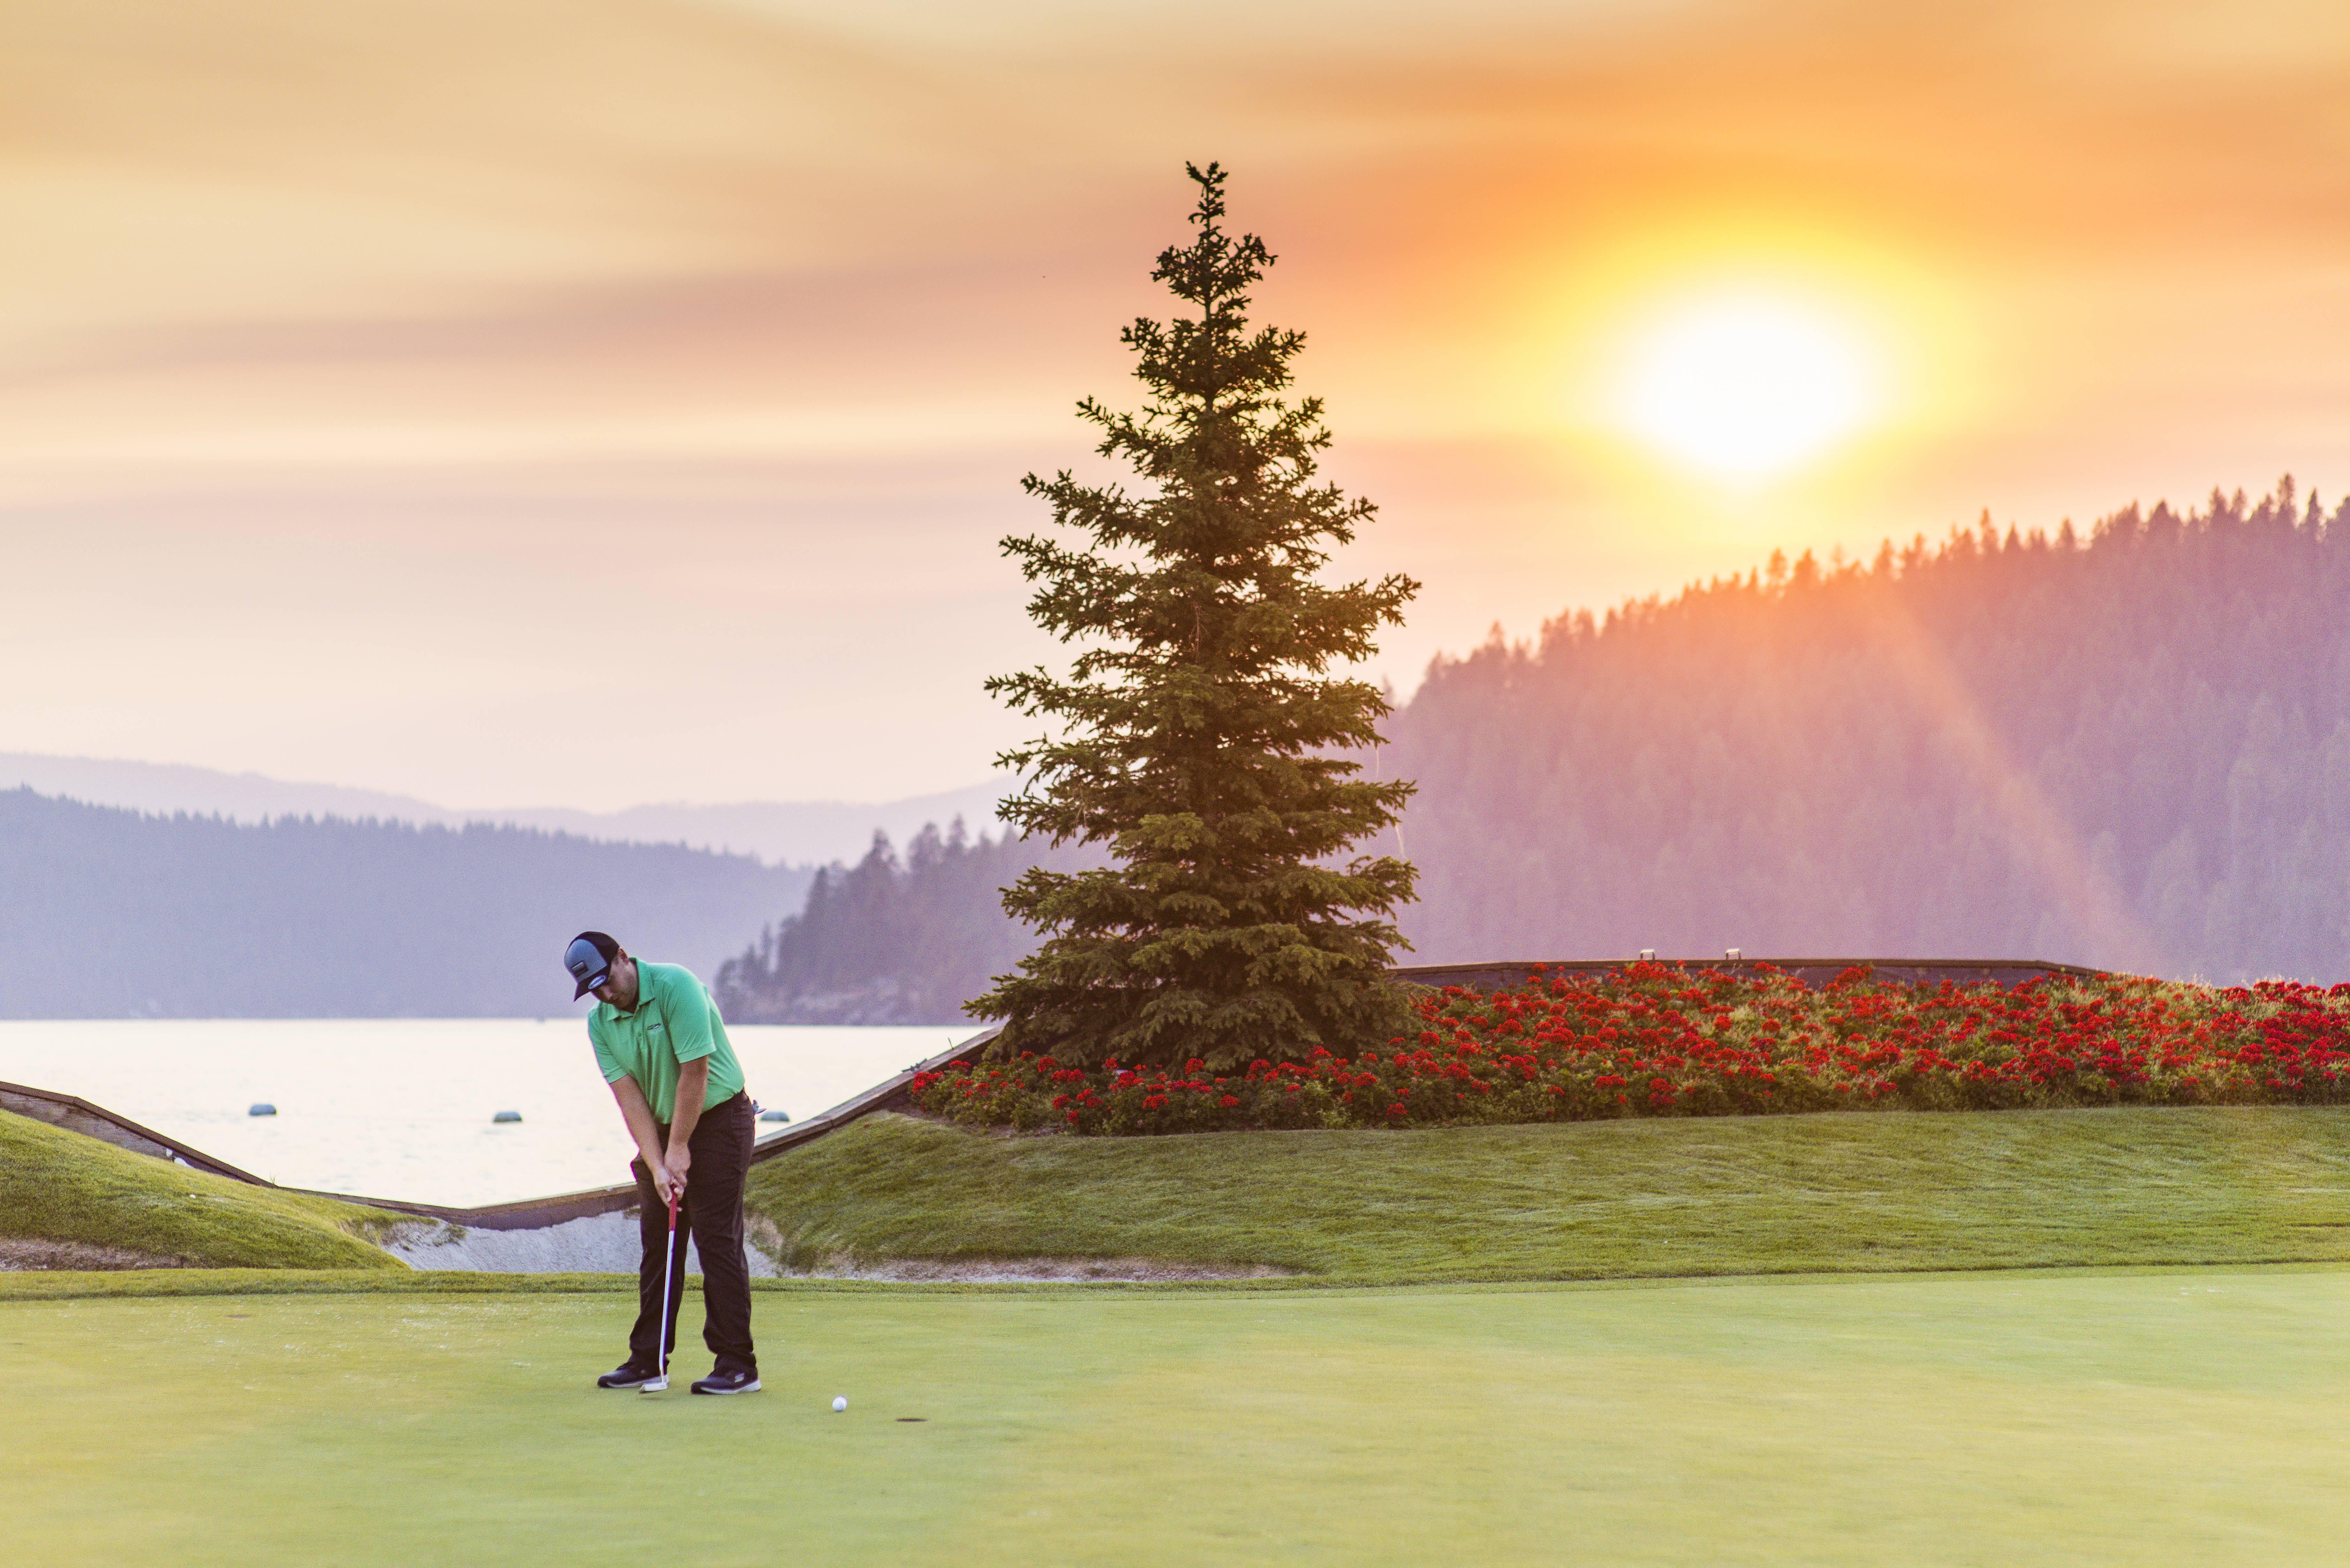 Golfing, Coeur d'Alene Golf Resort, Coeur d'Alene. Photo Credit: Idaho Tourism